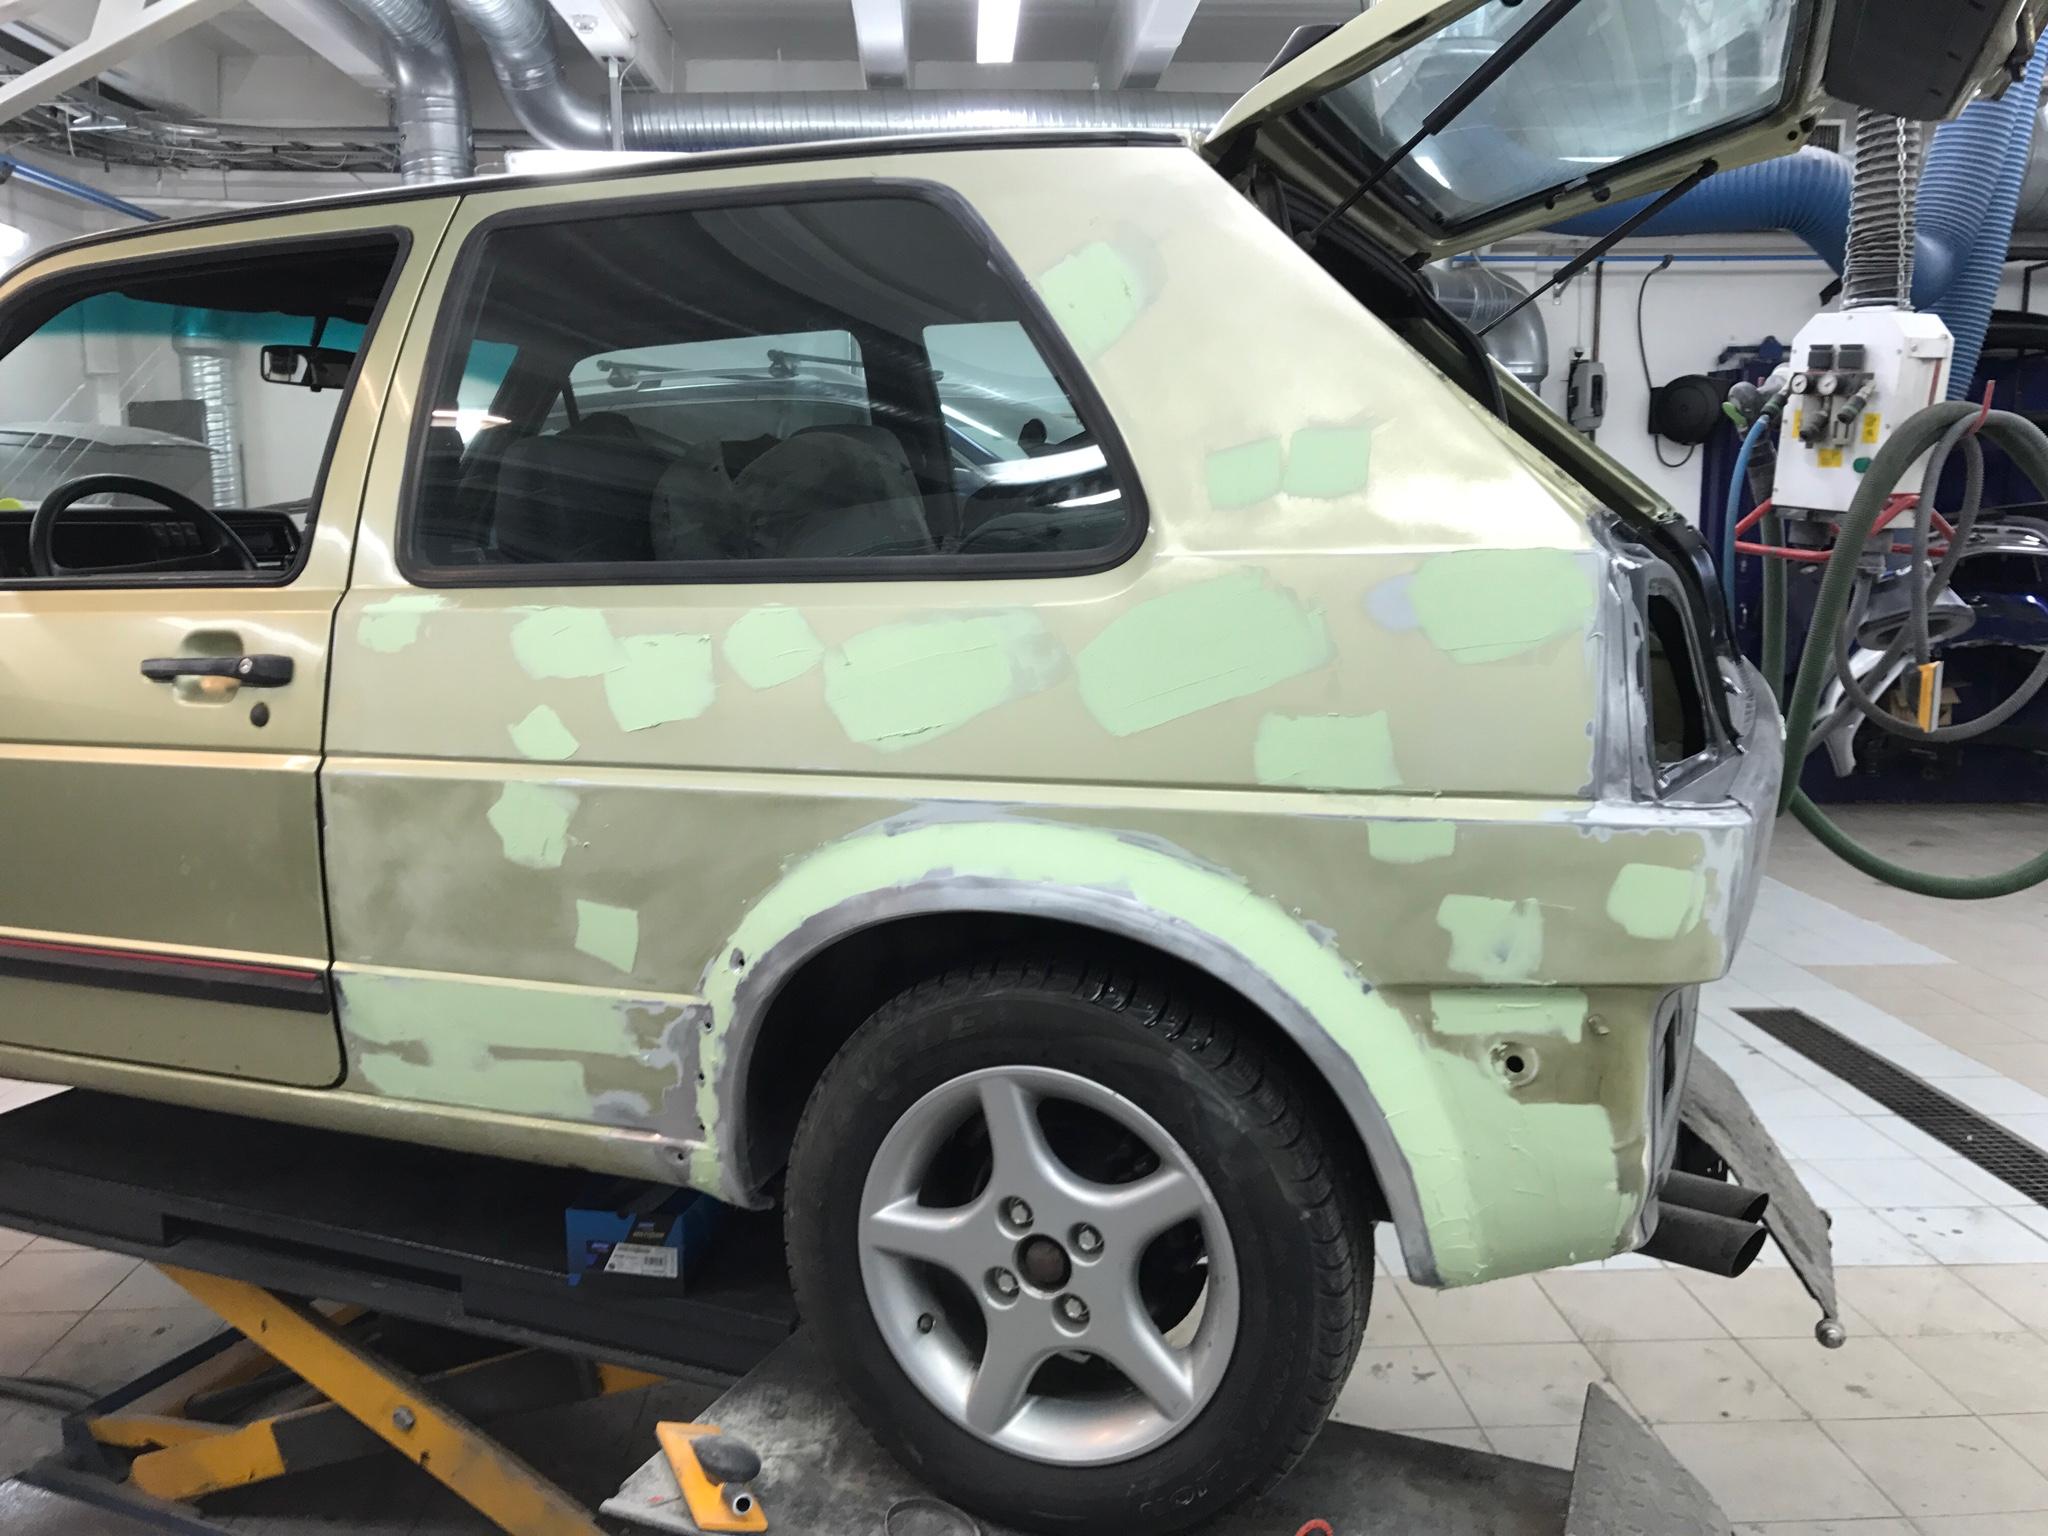 vwvortex com my 1986 golf mk2 3 doors gti 16v kr racing green rh forums vwvortex com VW GTI 16V Samco Sport VW Golf GTI 16V